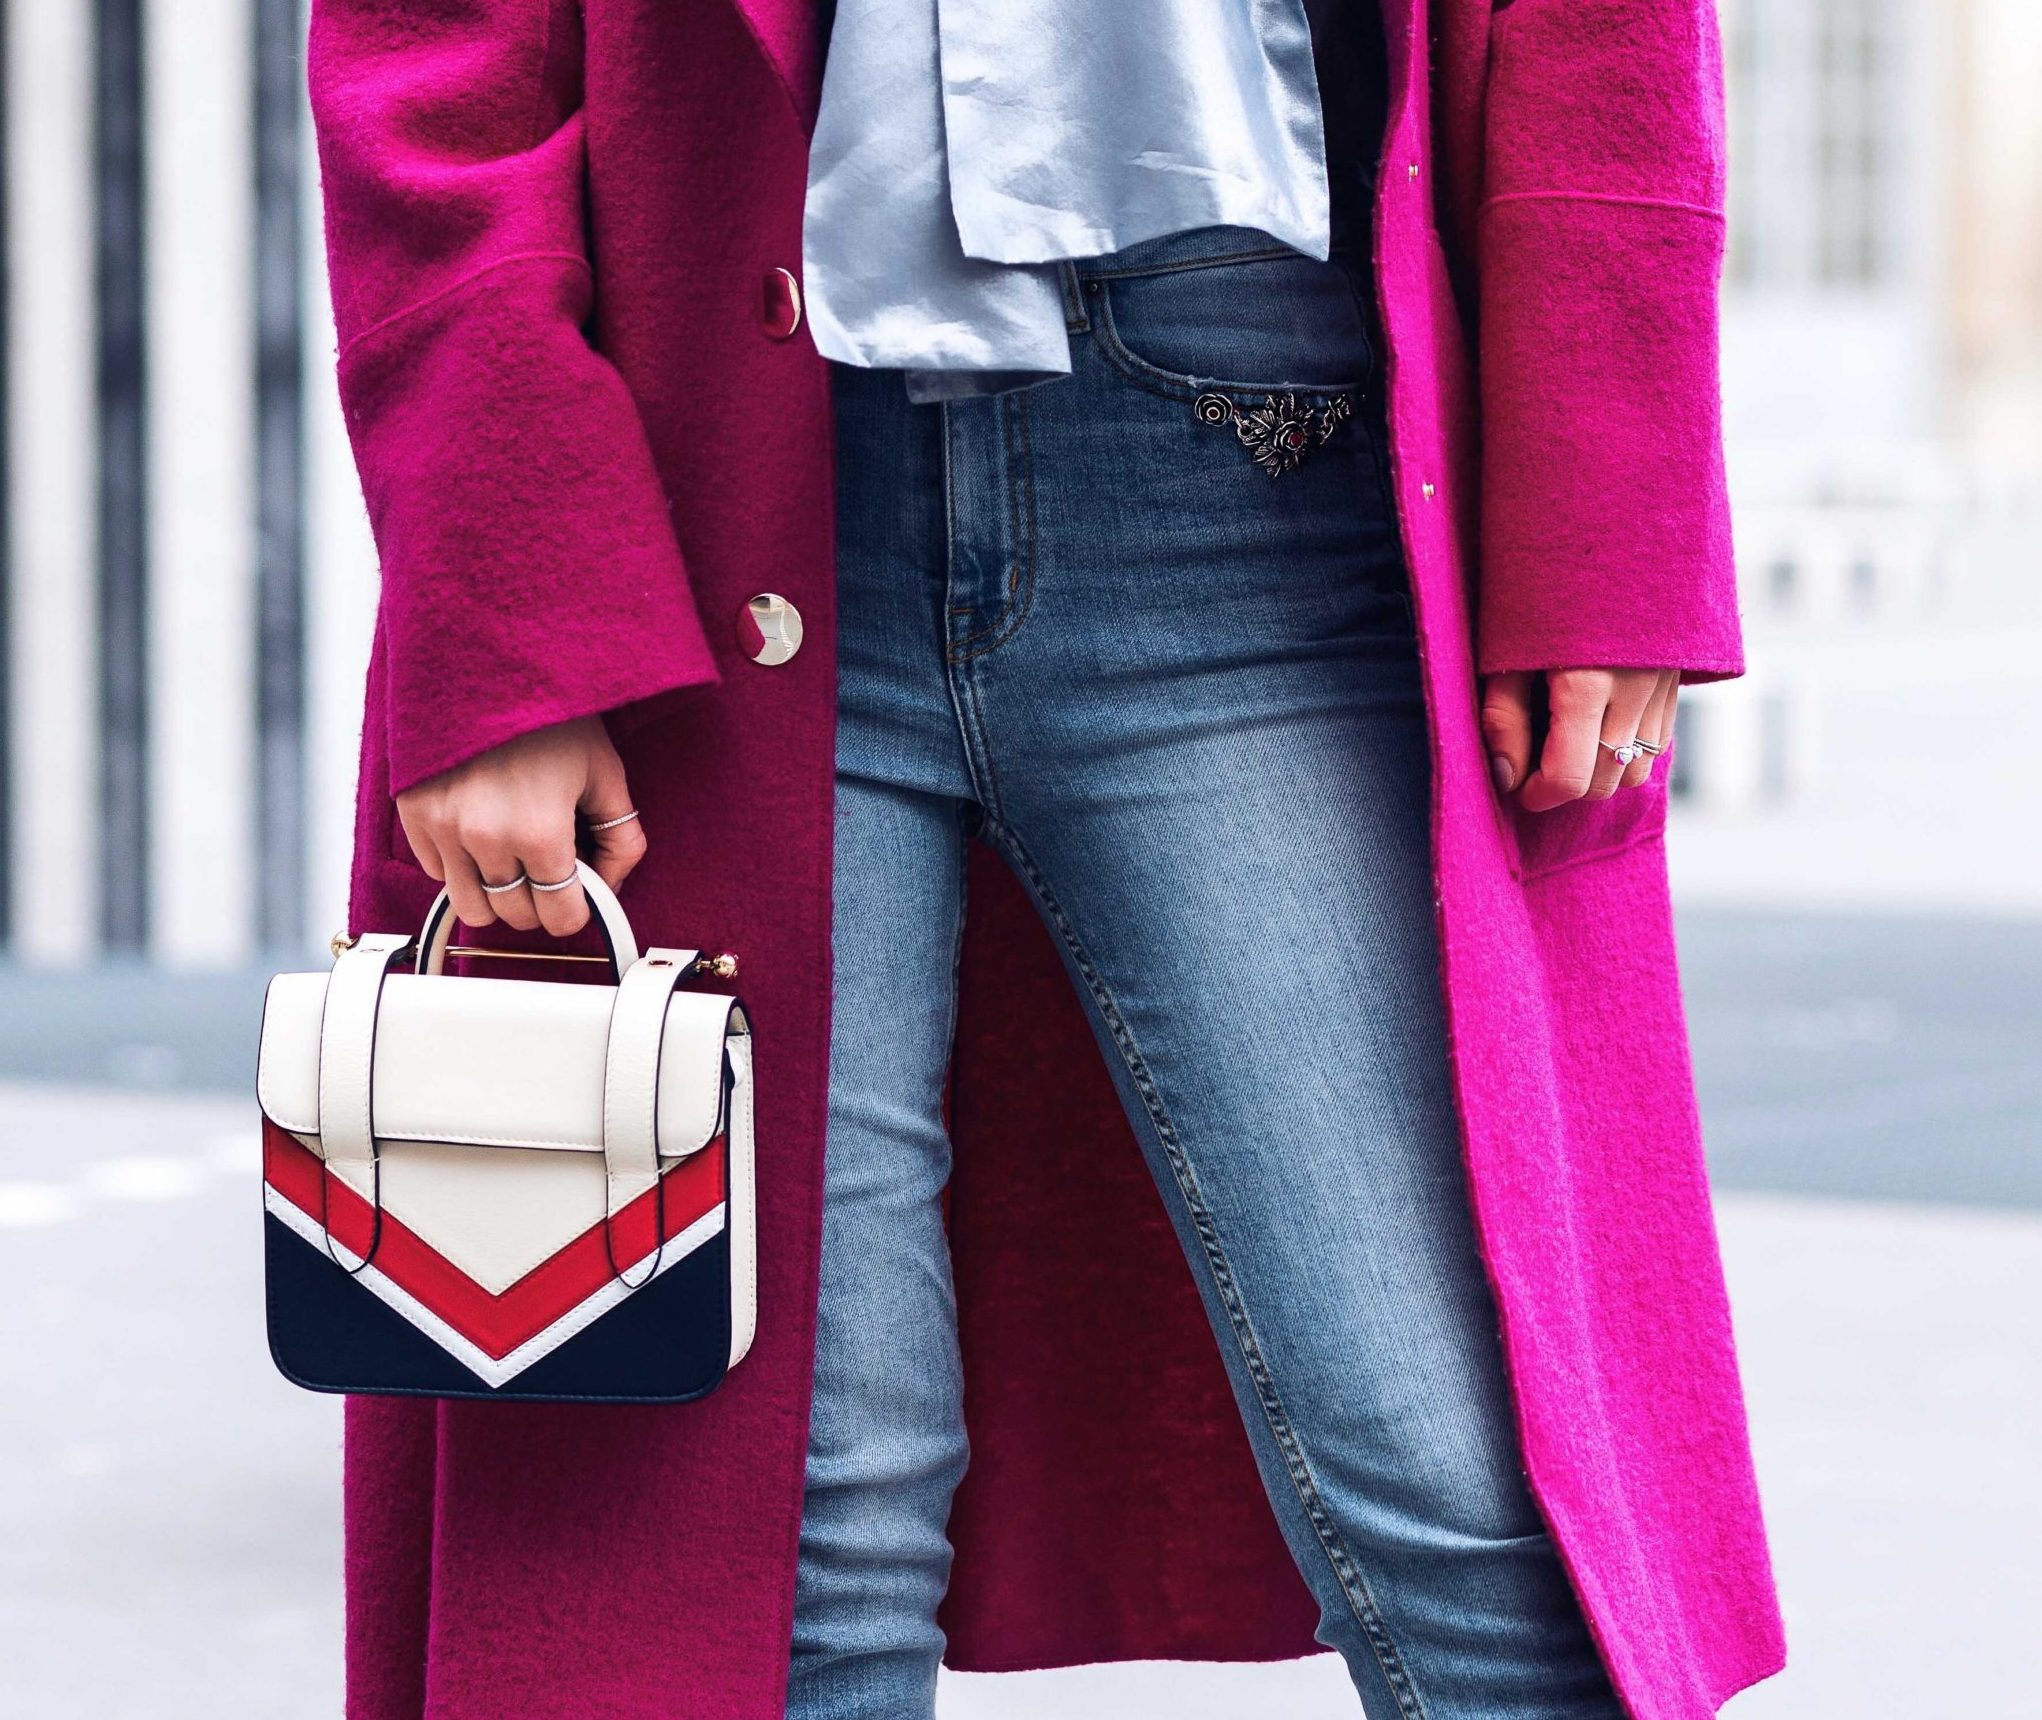 c42b6ec4692 Best Street Style Paris Fashion Week Mars 2018 of Julia Comil / French  Fashion Blogger in